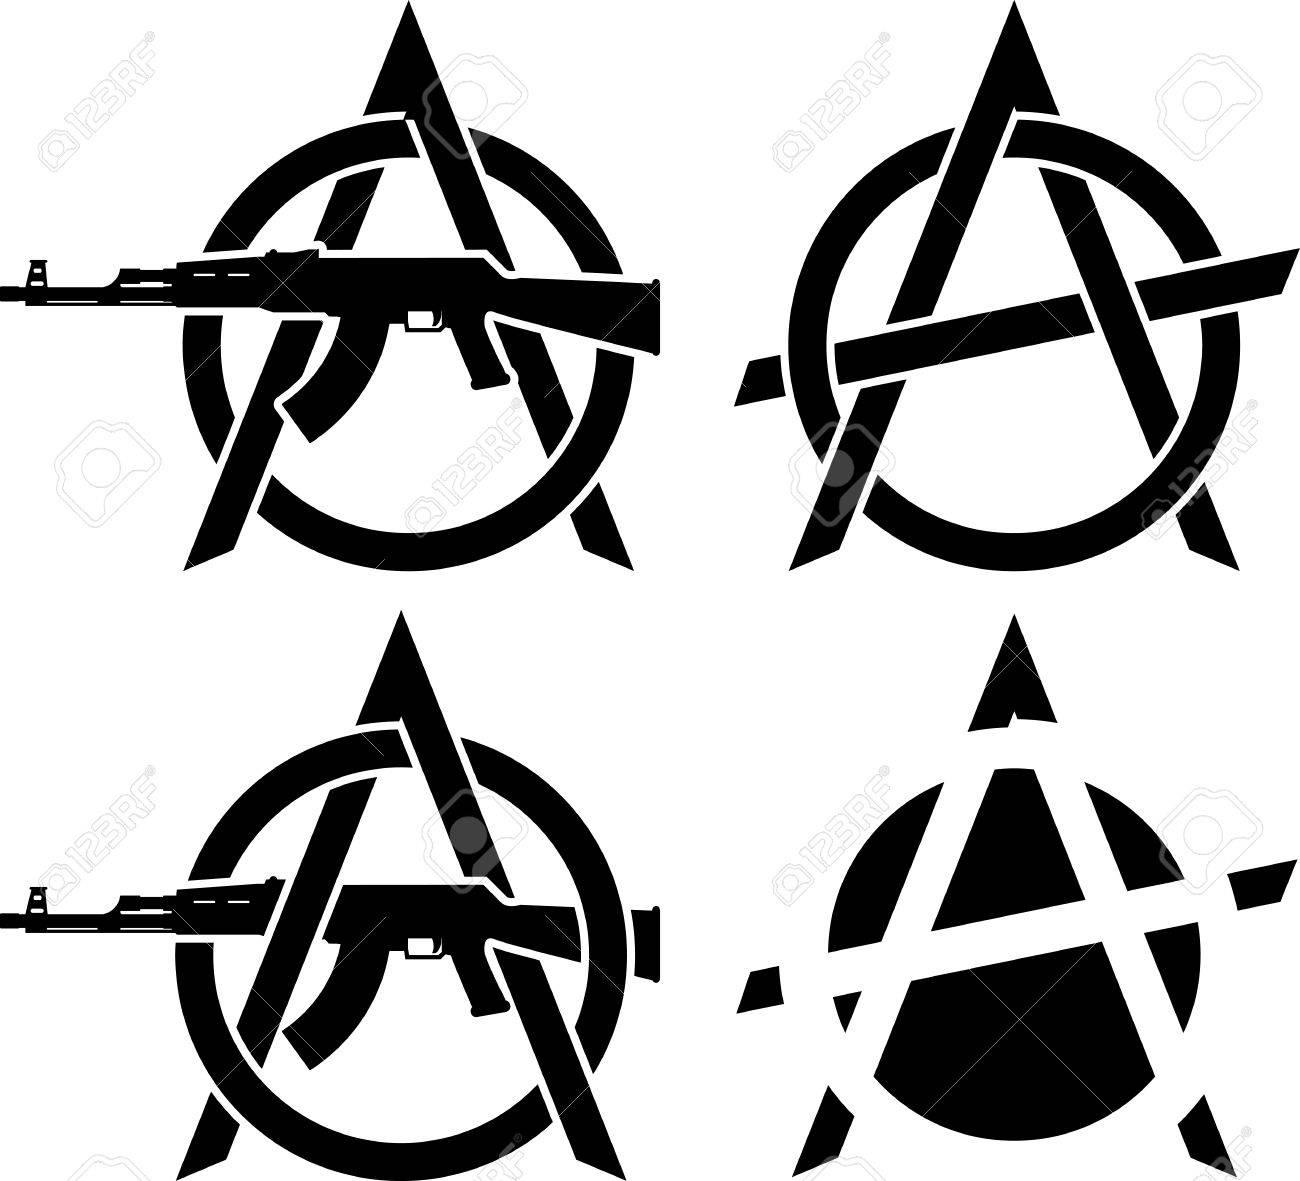 Symbols of anarchy vector illustration royalty free cliparts symbols of anarchy vector illustration stock vector 32631293 buycottarizona